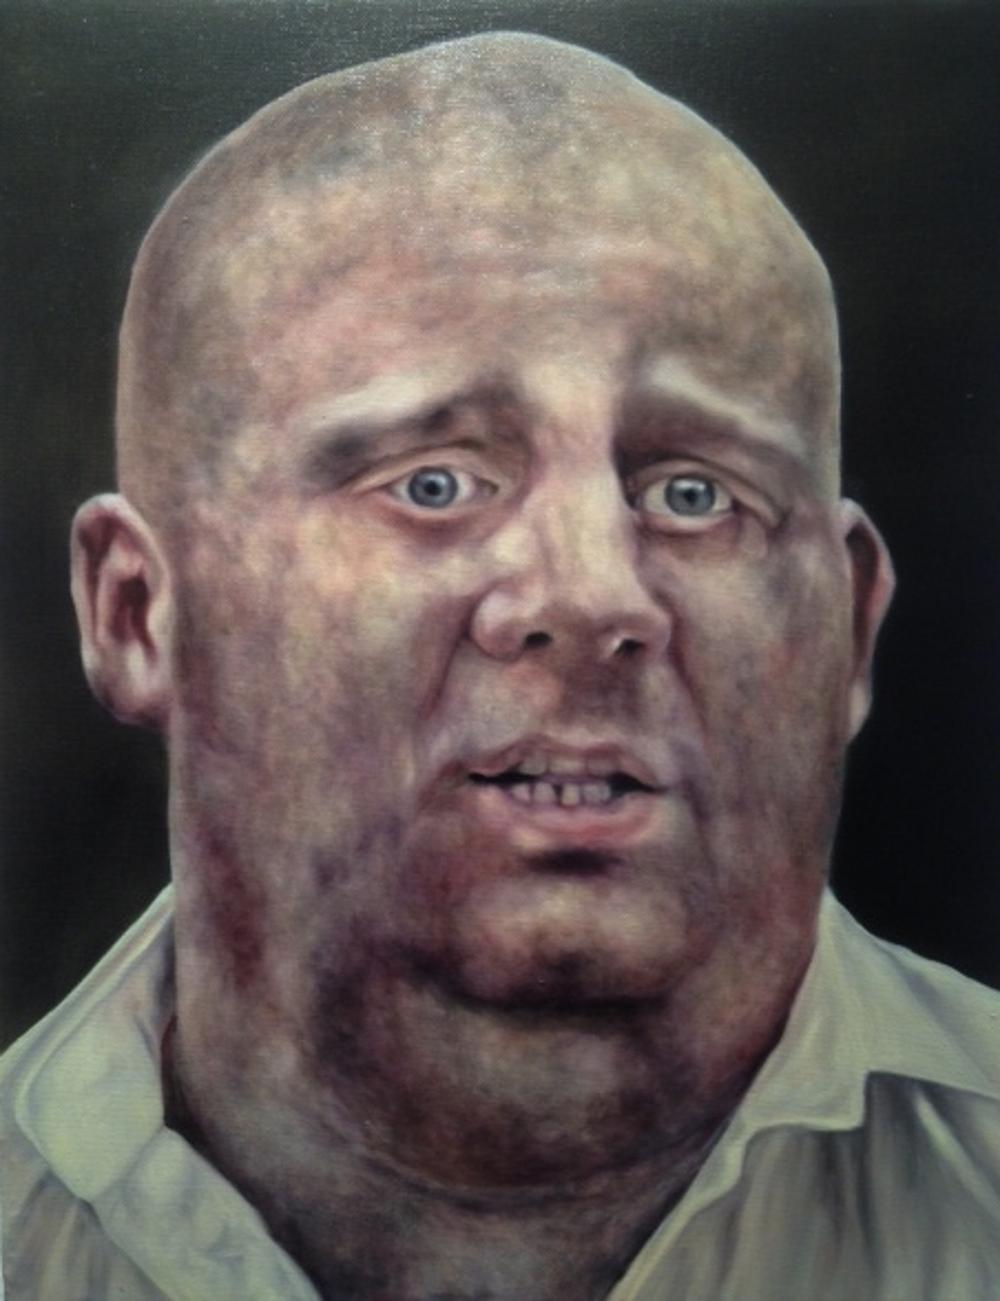 Fat Eyed